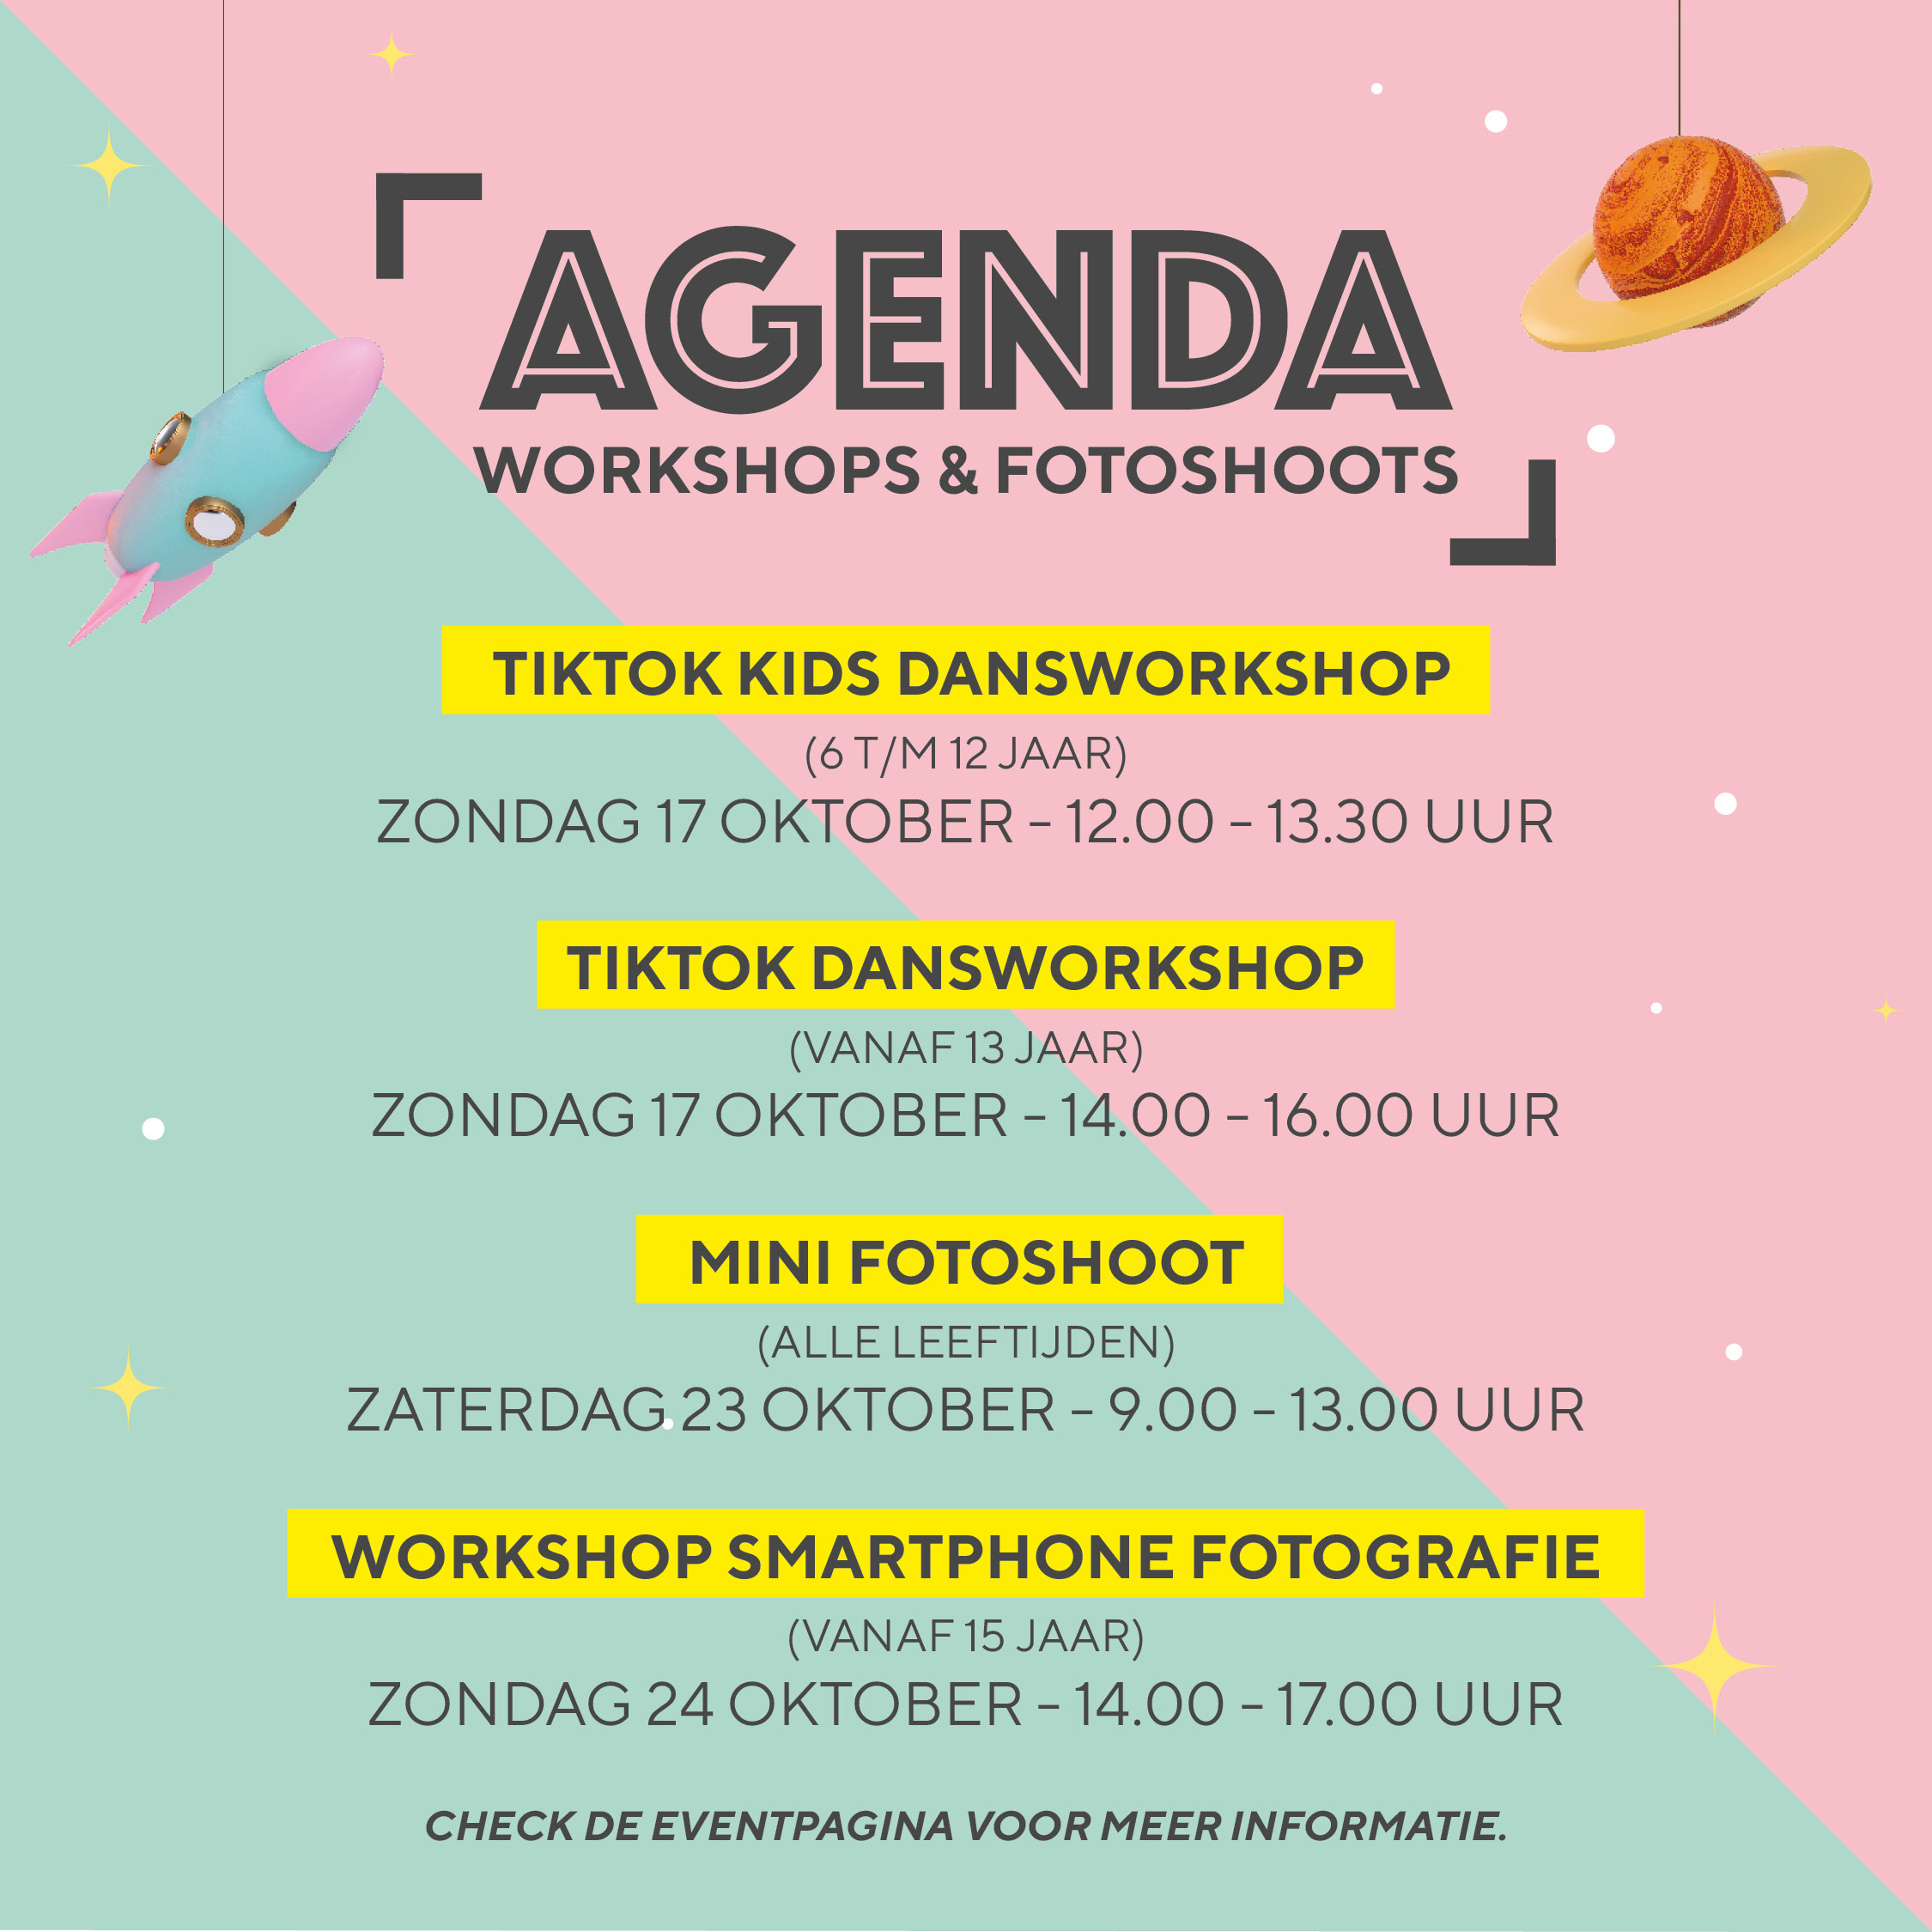 Agenda workshops en mini fotoshoots Likeland events